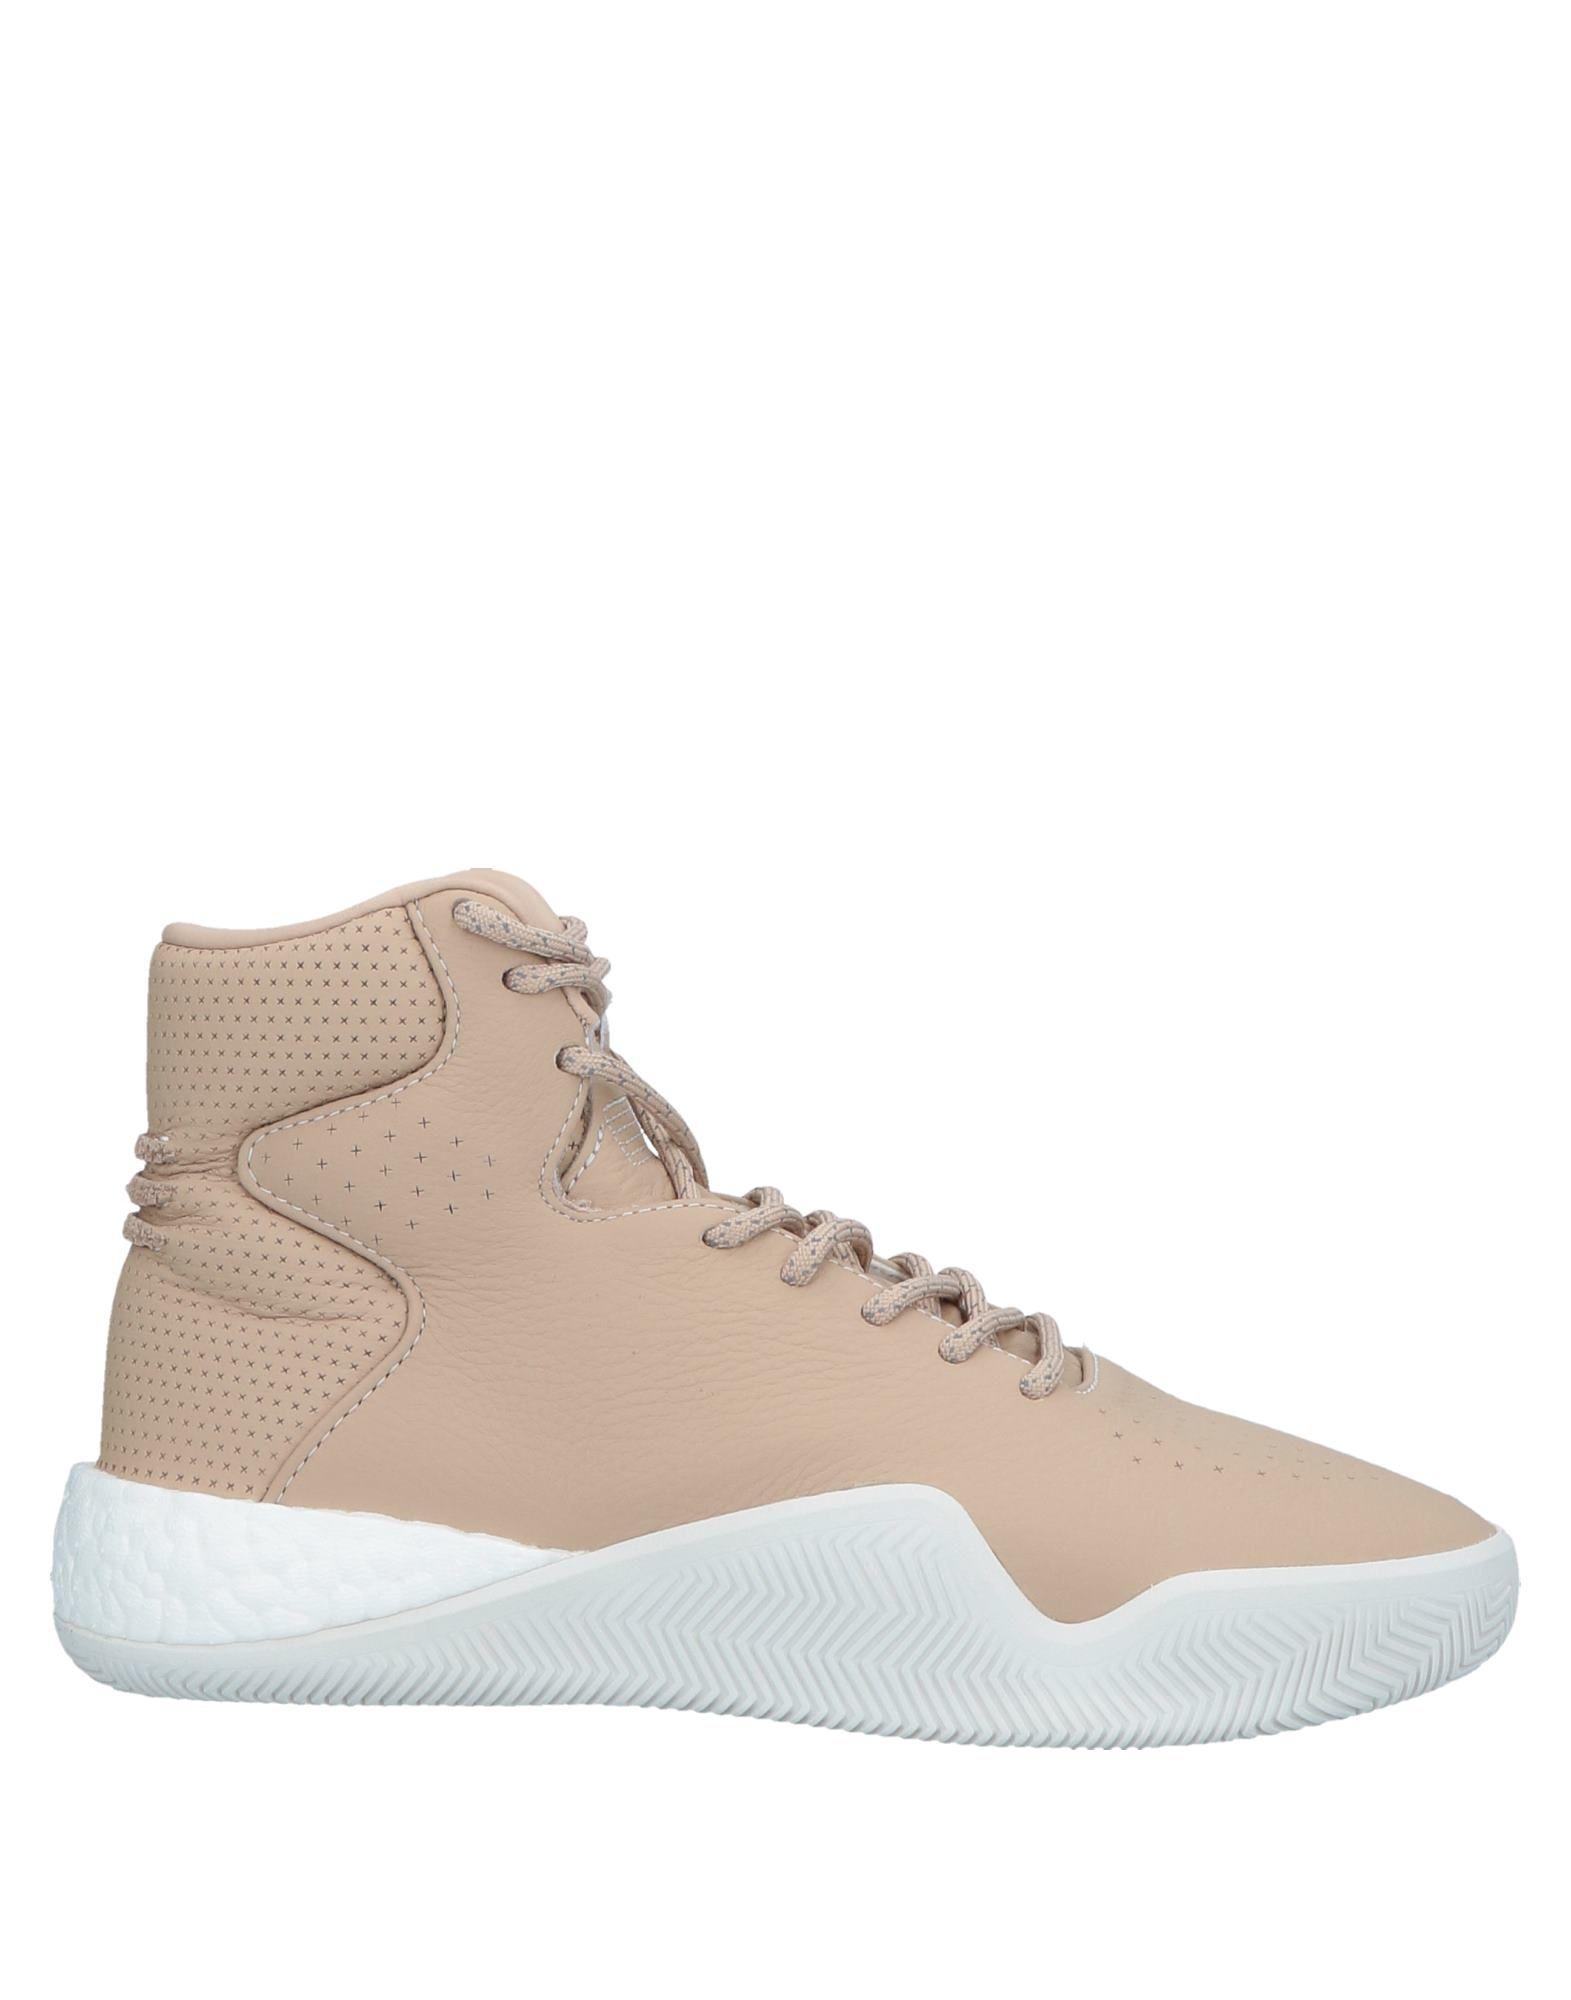 cheaper 853c4 259d8 adidas Originals. Women s Natural High-tops   Sneakers